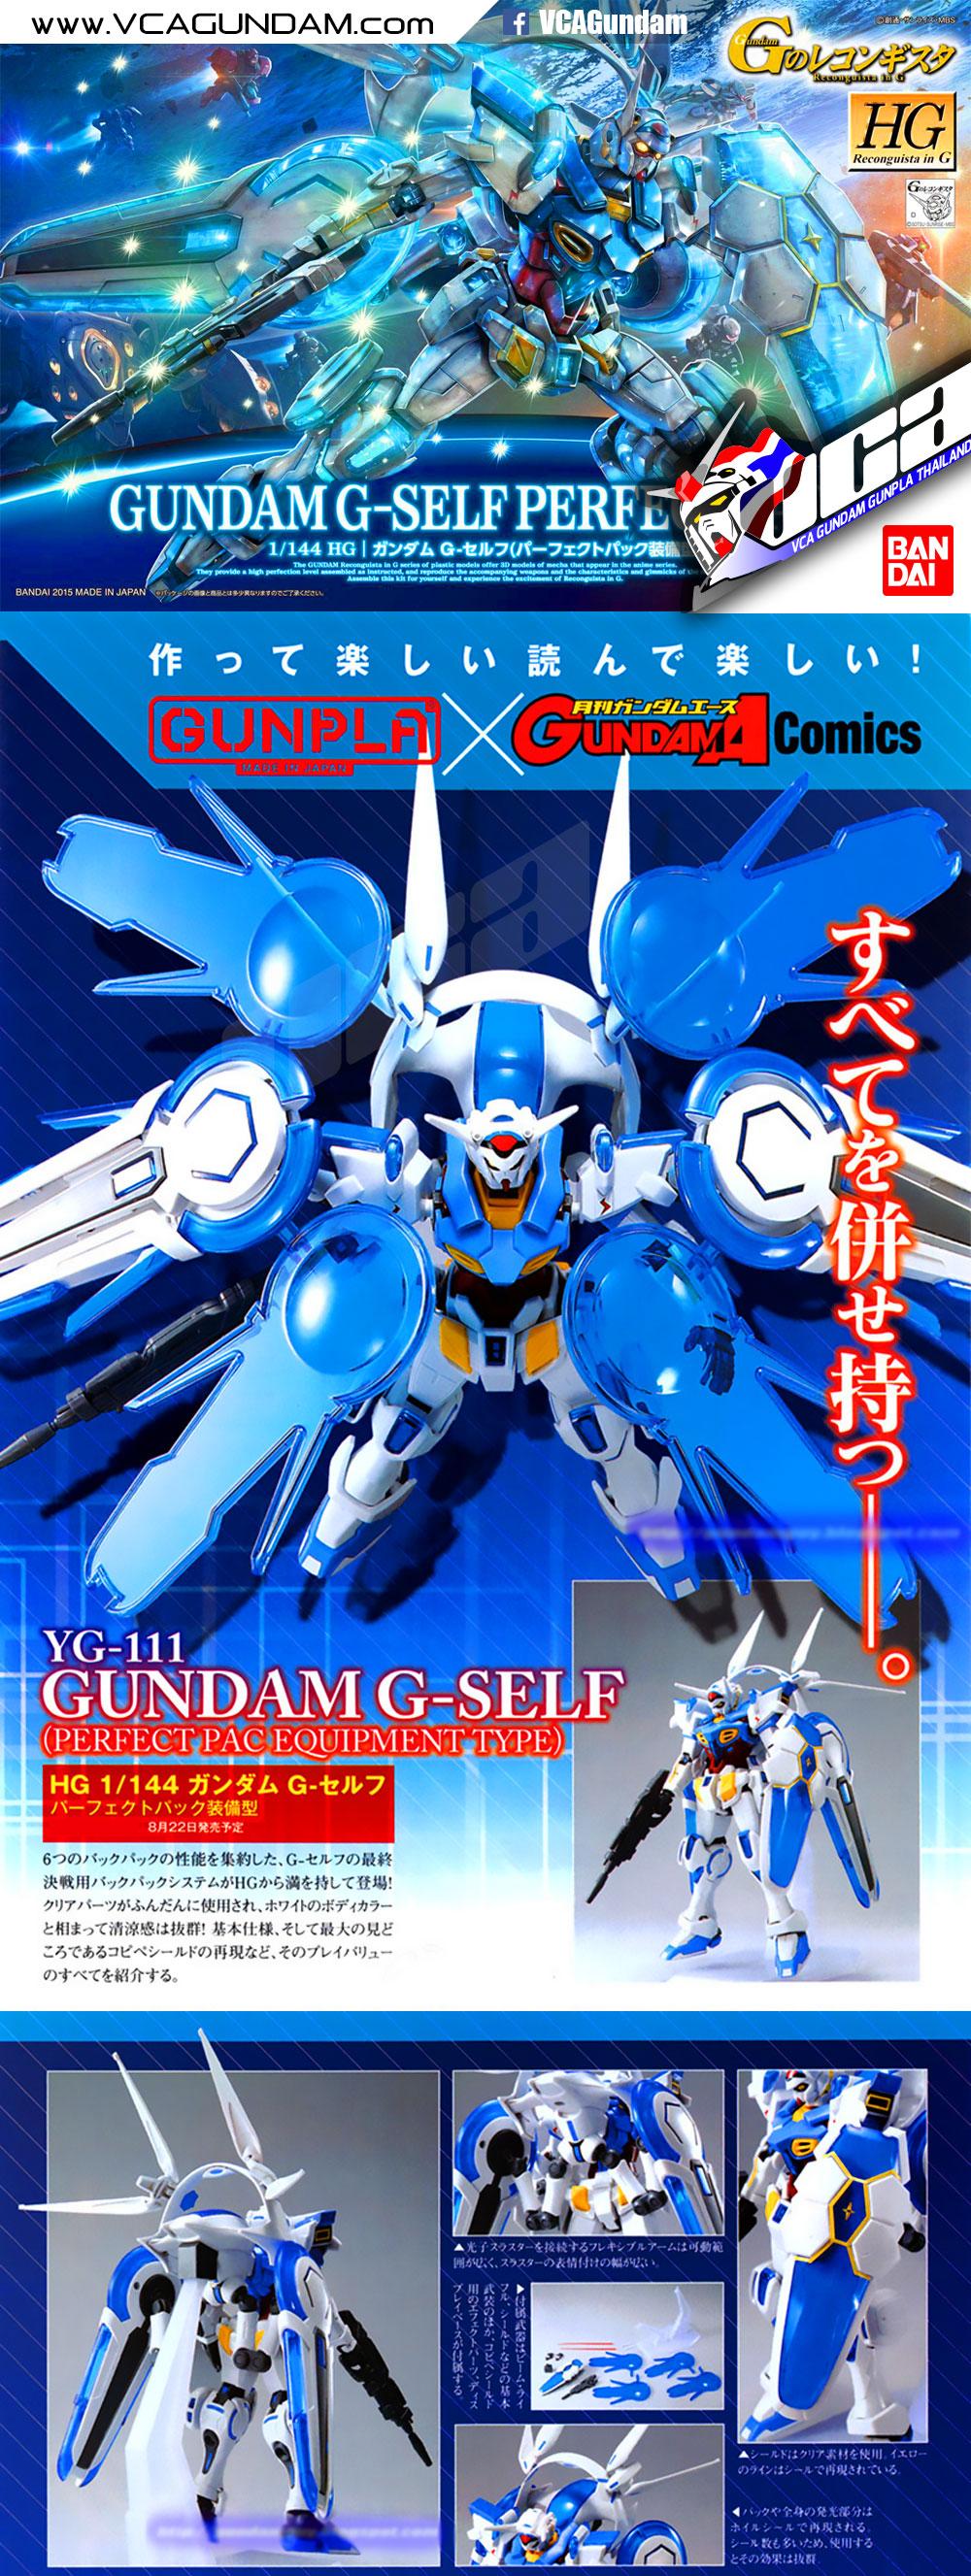 HG GUNDAM G-SELF PERFECT PACK กันดั้ม จี-เซลฟ์ เพอเฟ็คท์ แพ็ค